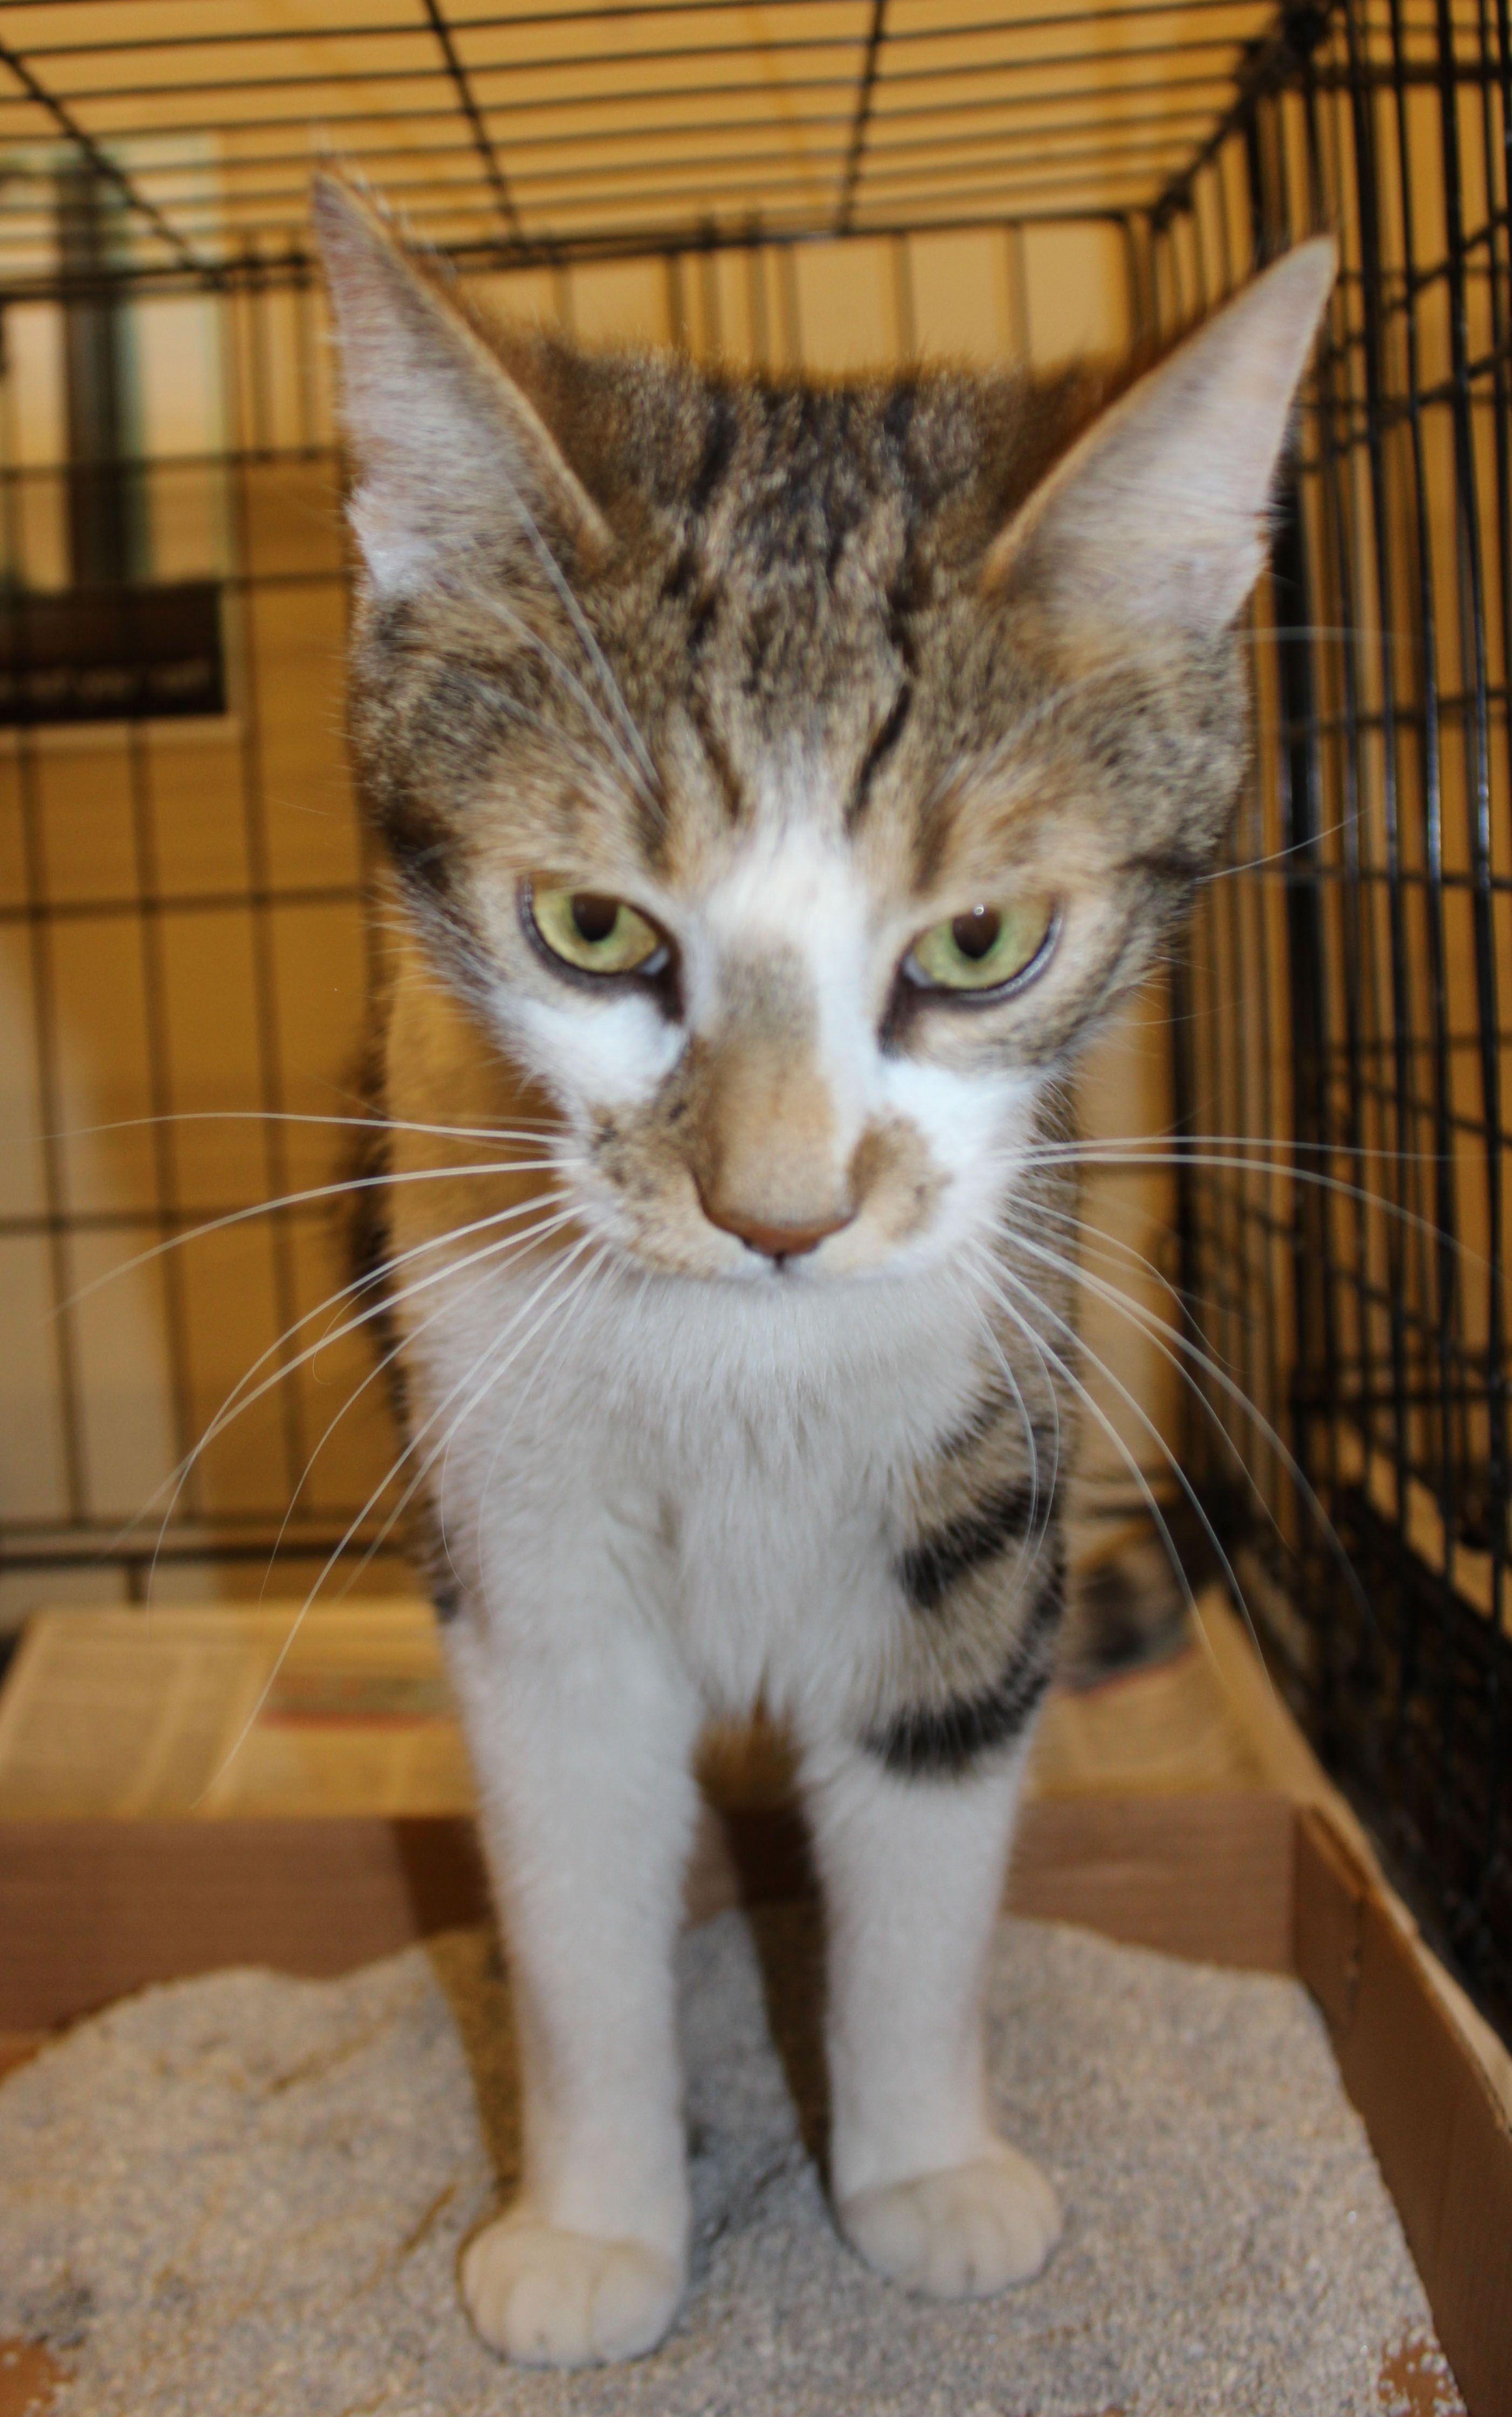 Come Visit Gigi At The Fair Lakes Petsmart Cat Adoption Petsmart Adoption Center